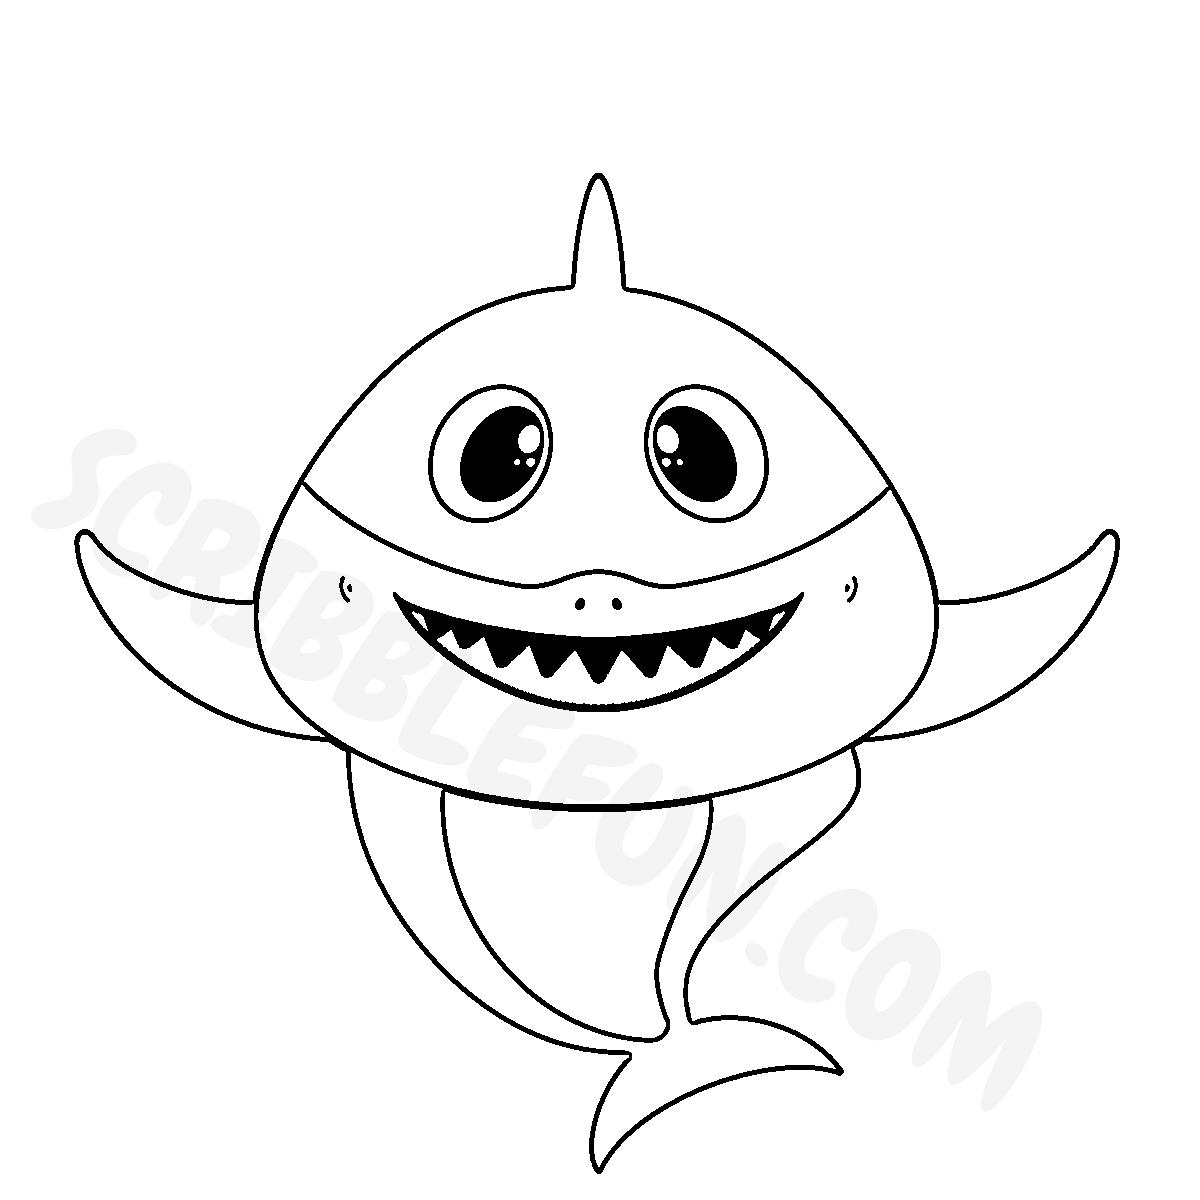 Mommy Shark from Baby Shark song